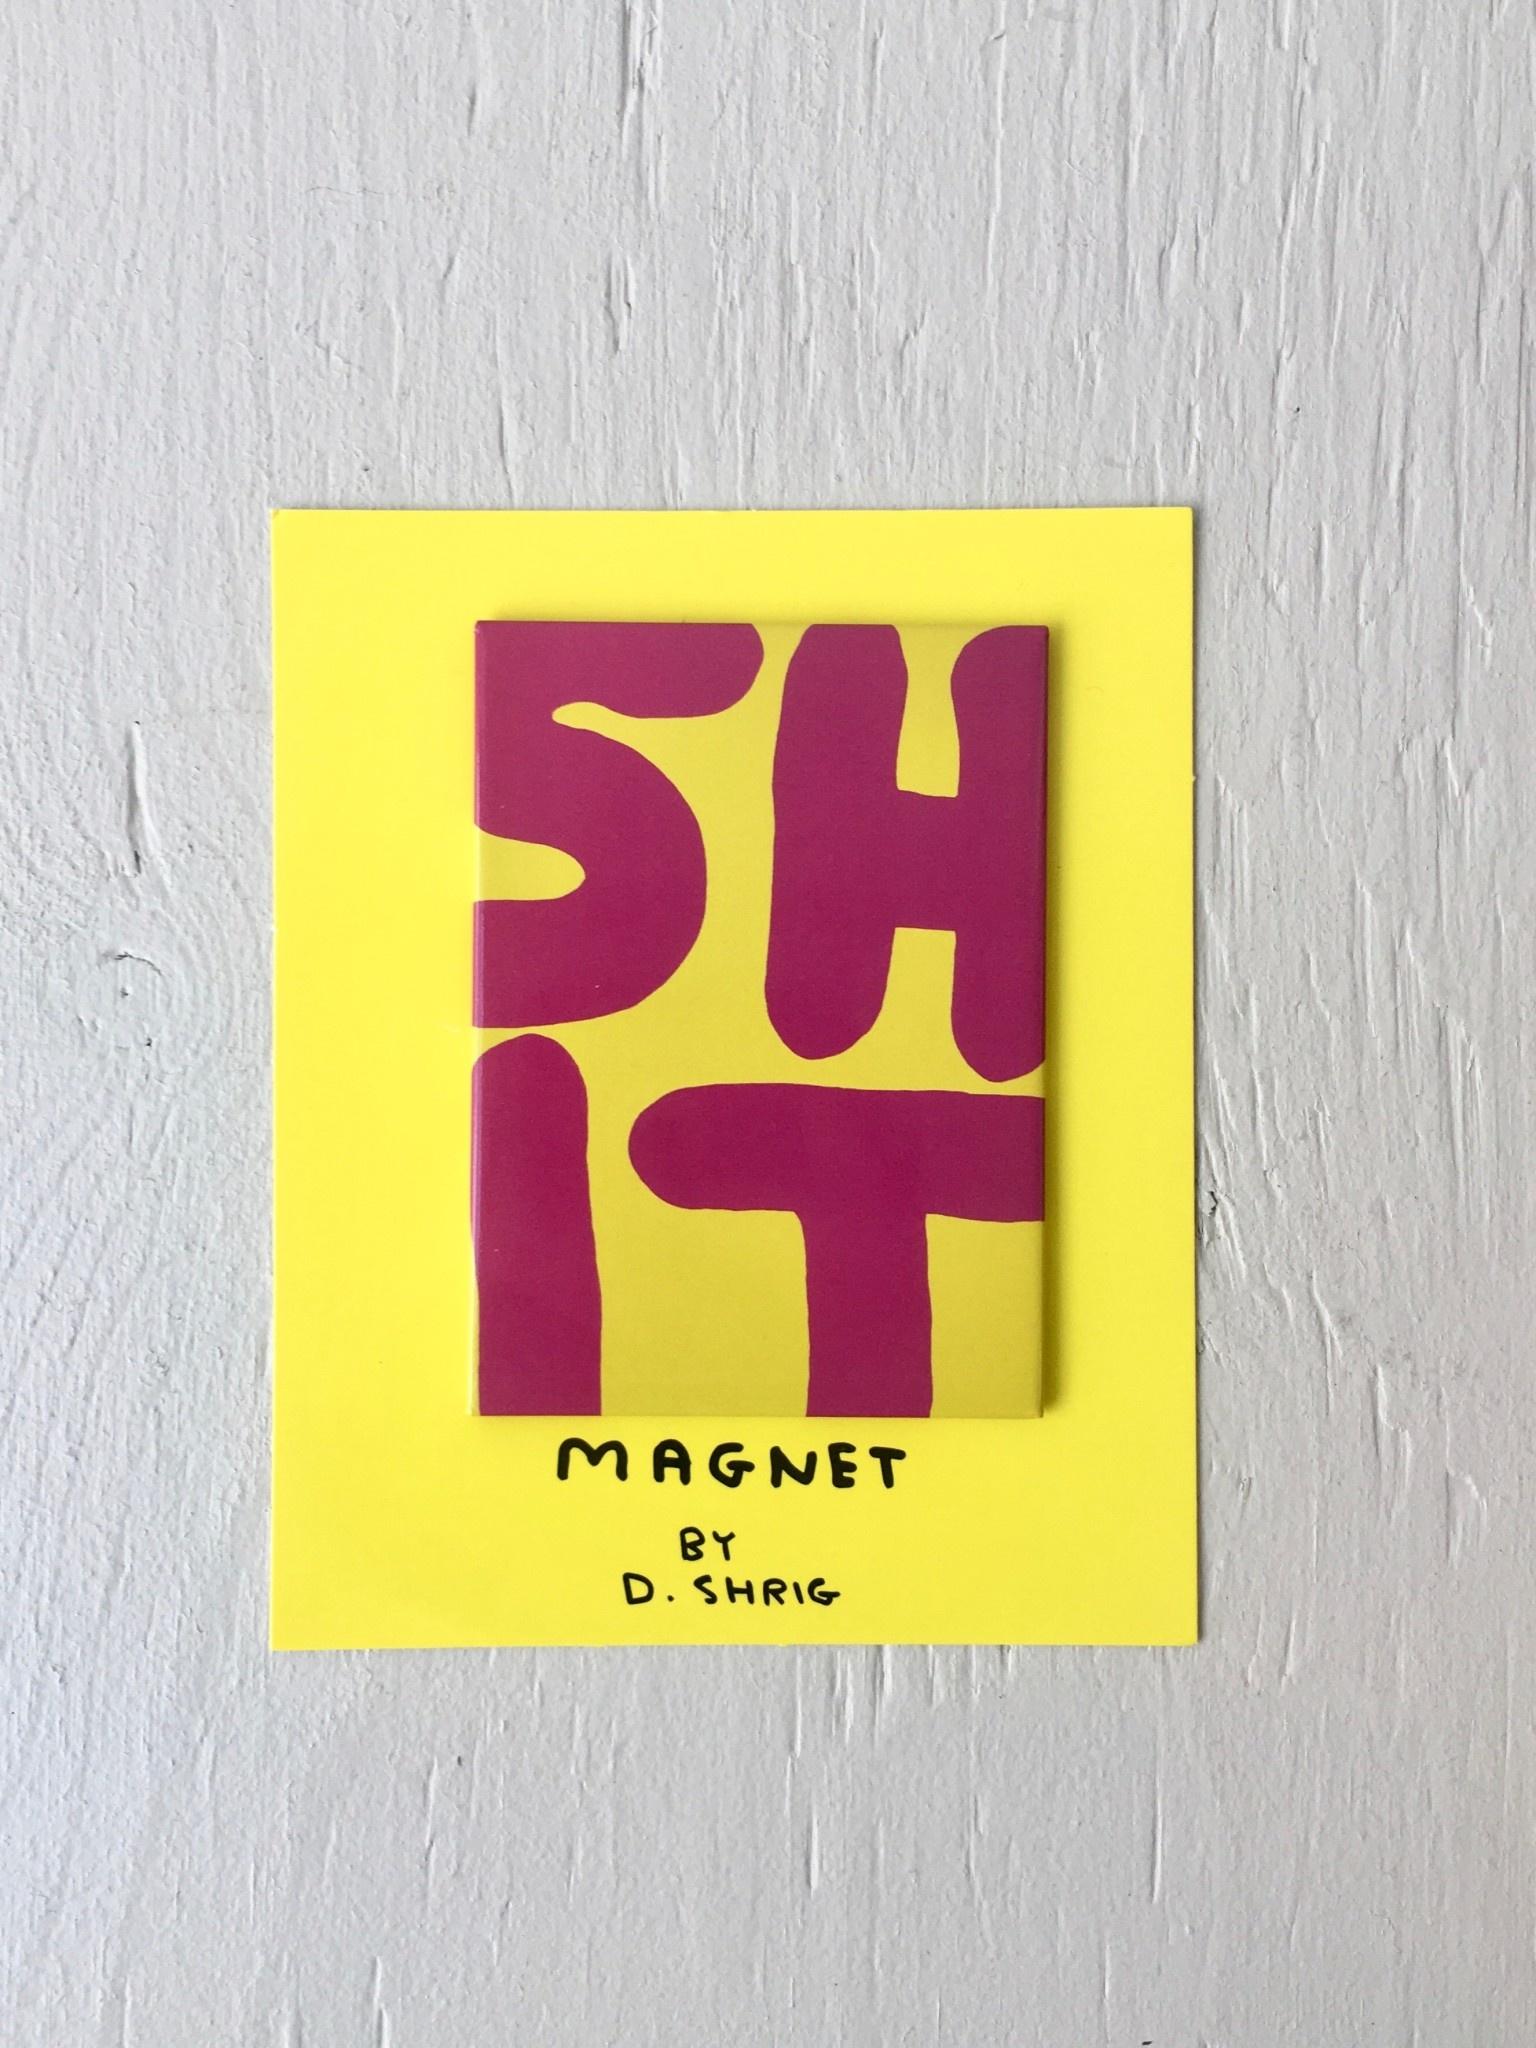 Third Drawer Down Art Magnets